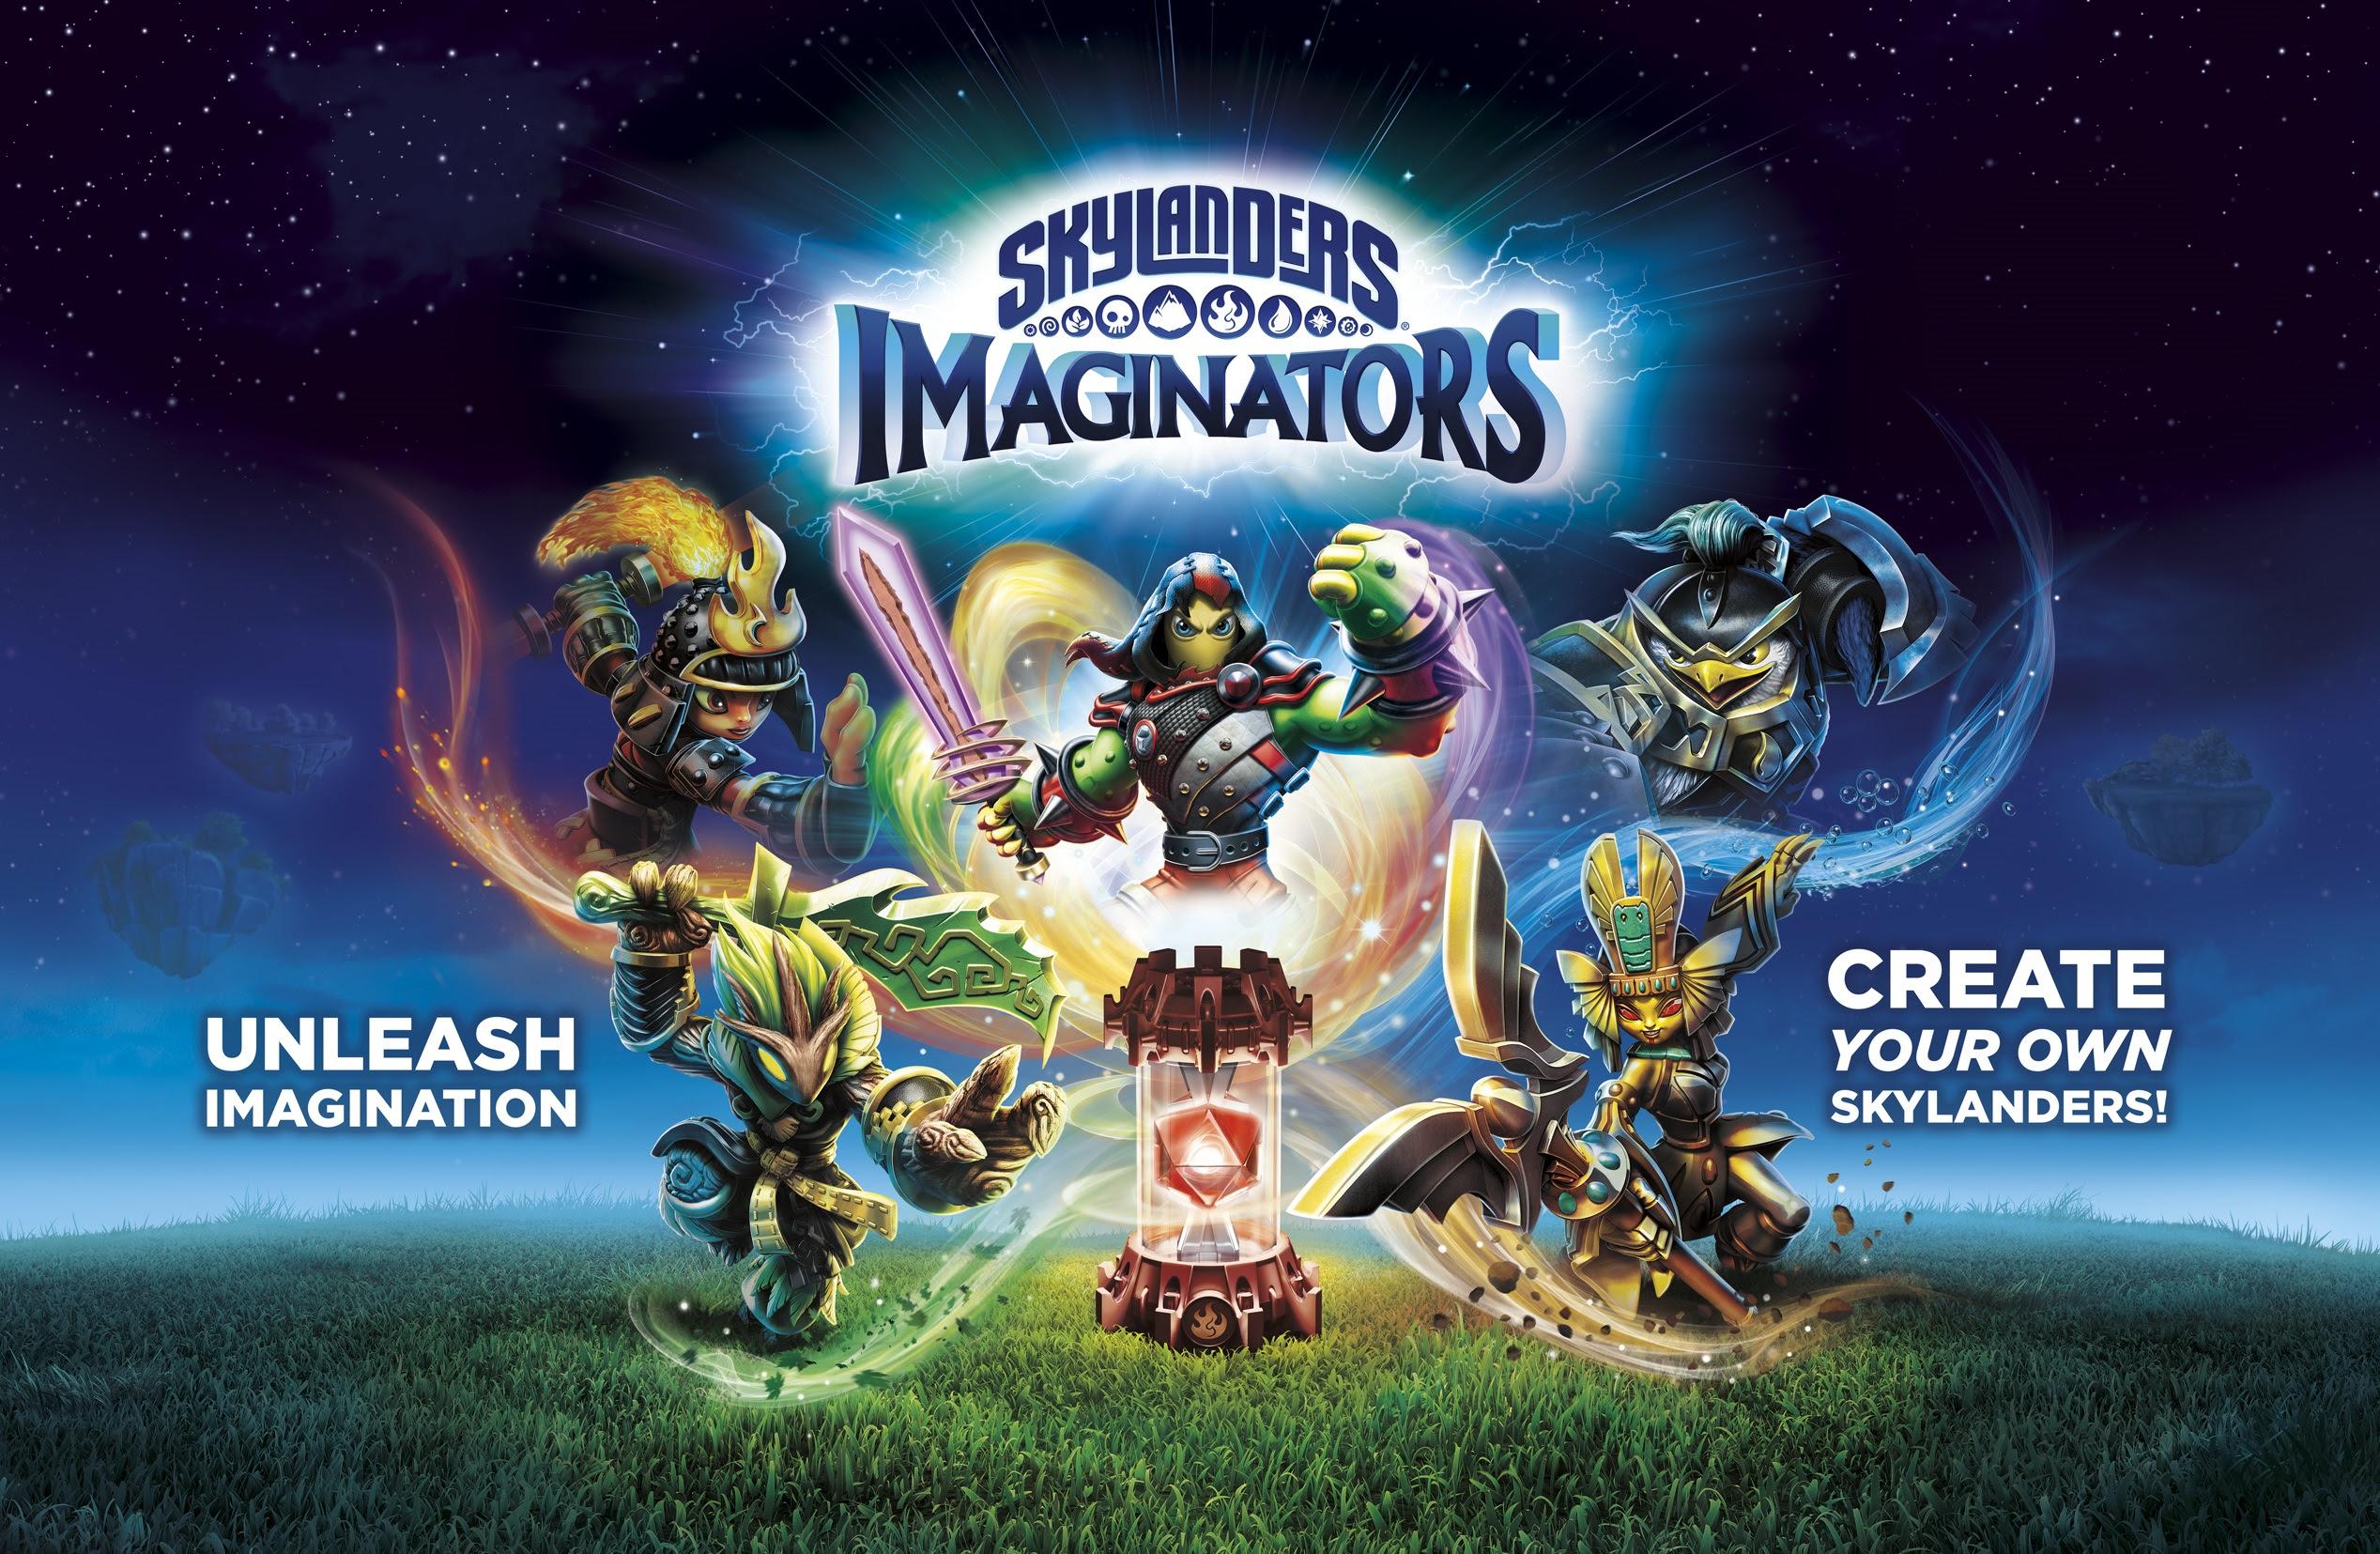 Resultado de imagem para Skylanders Imaginators